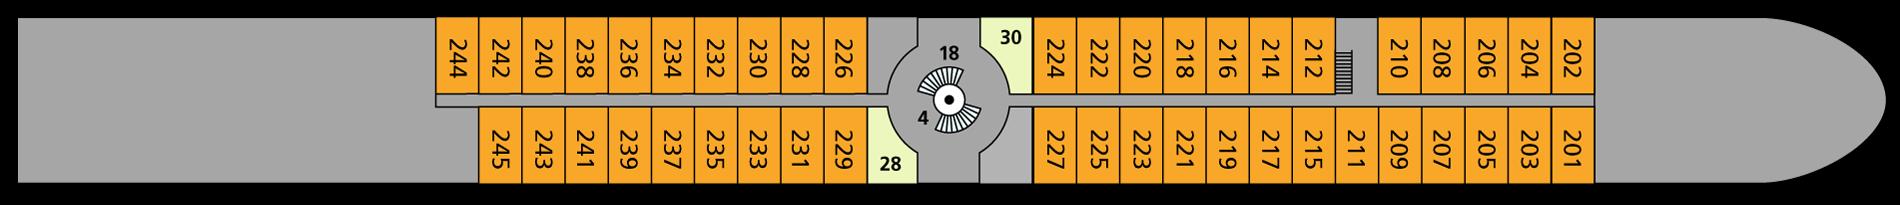 A-ROSA BRAVA Deck 2